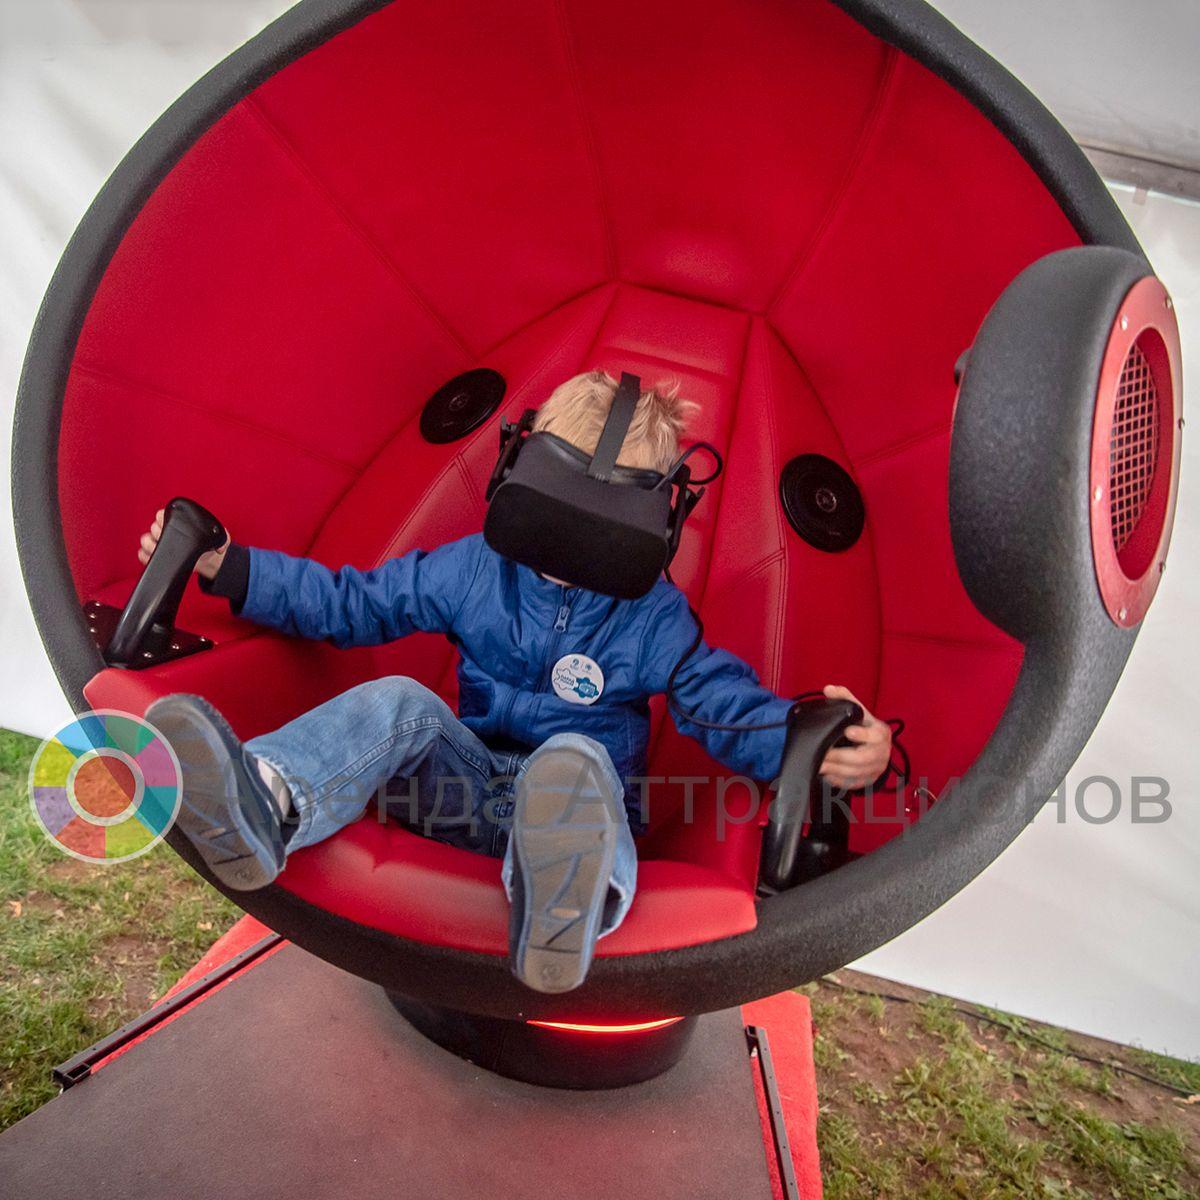 Заказать VR шаттл на мероприятие